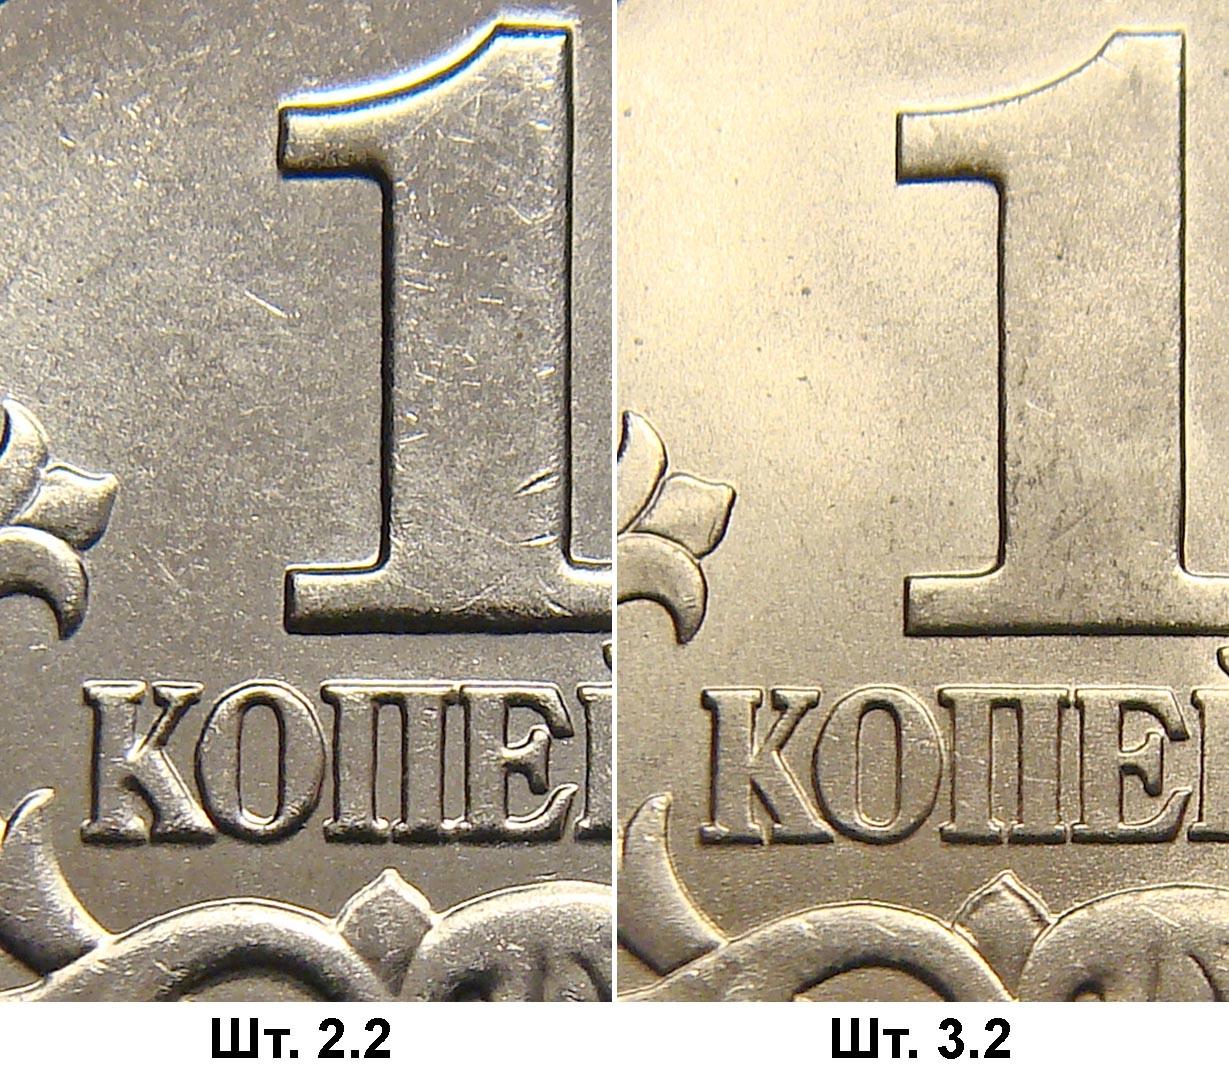 сравнение шт.2.2-3.2 1 копейки по А.Сташкину